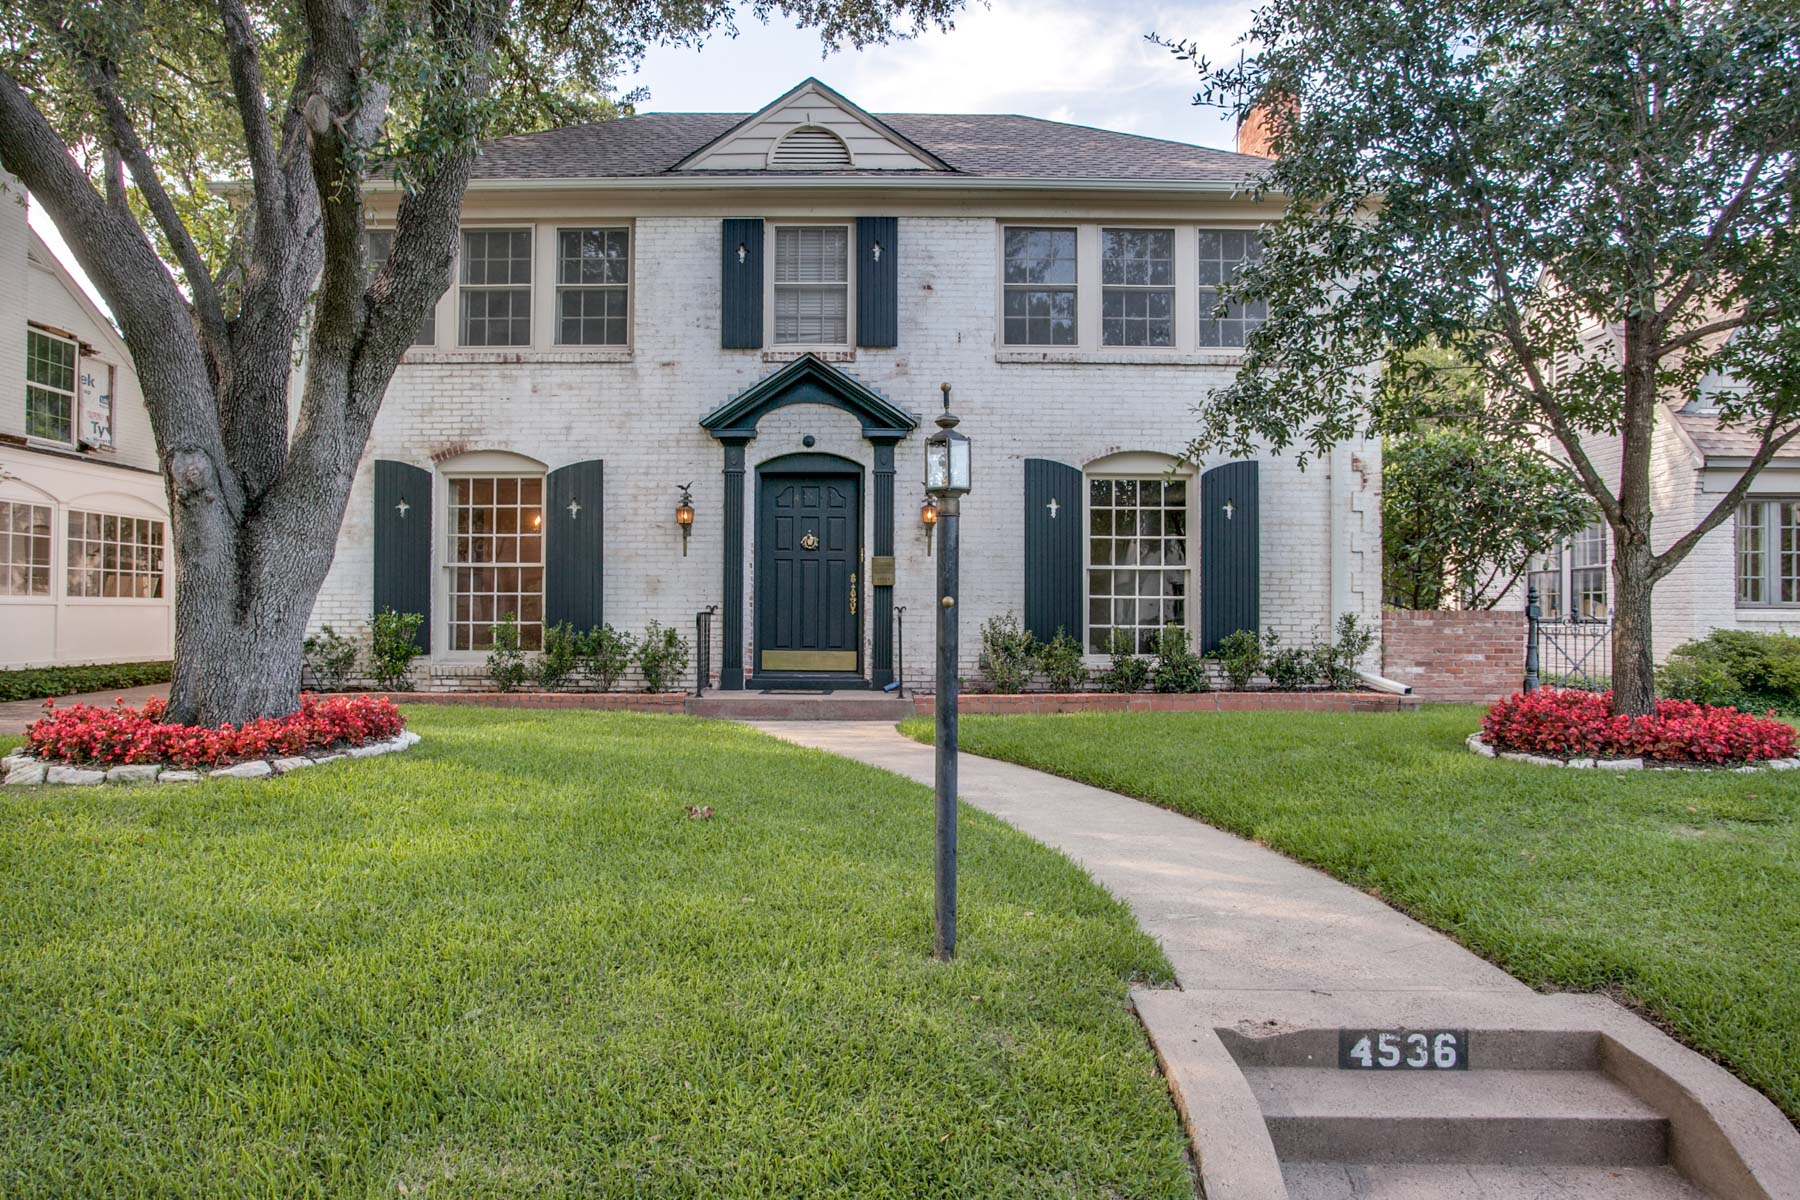 Частный односемейный дом для того Продажа на Traditional Home with Nice Drive Up 4536 N Versailles Ave Highland Park, Техас, 75205 Соединенные Штаты